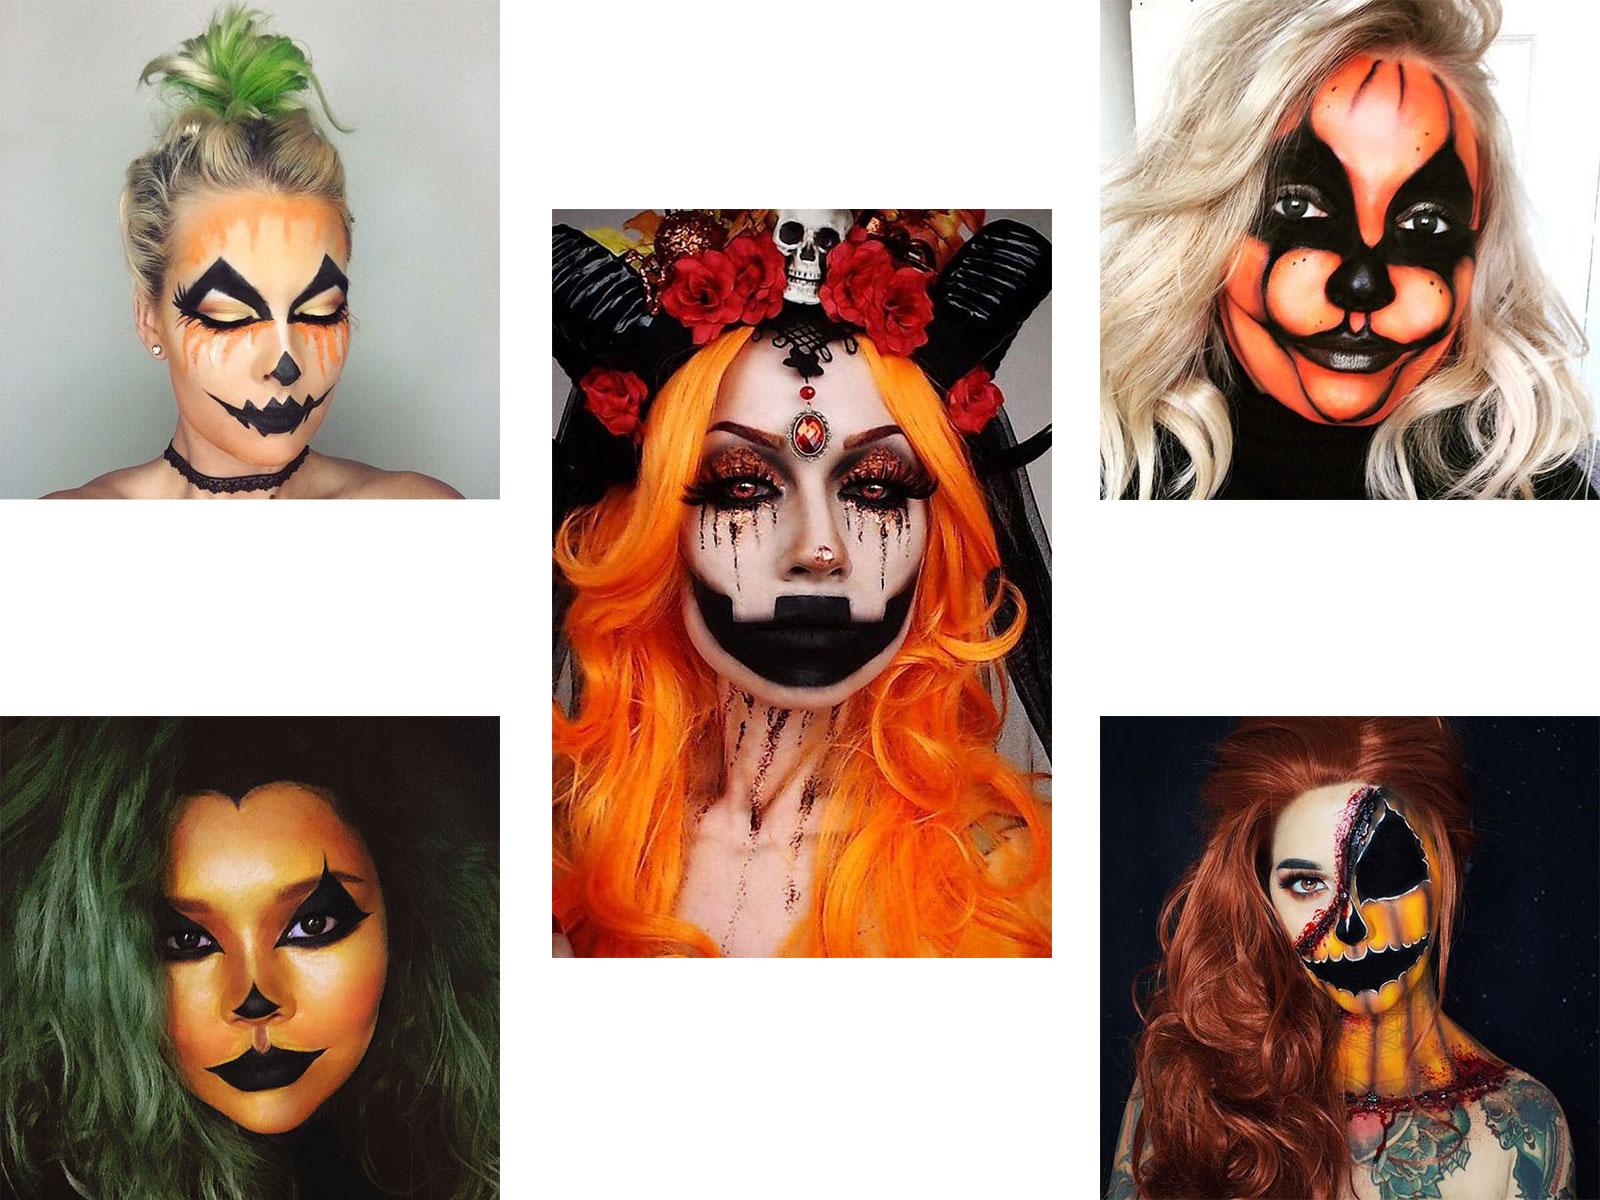 15-Scary-Pumpkin-Jack-o-Lantern-Halloween-Face-Makeup-Ideas-Looks-2019-F